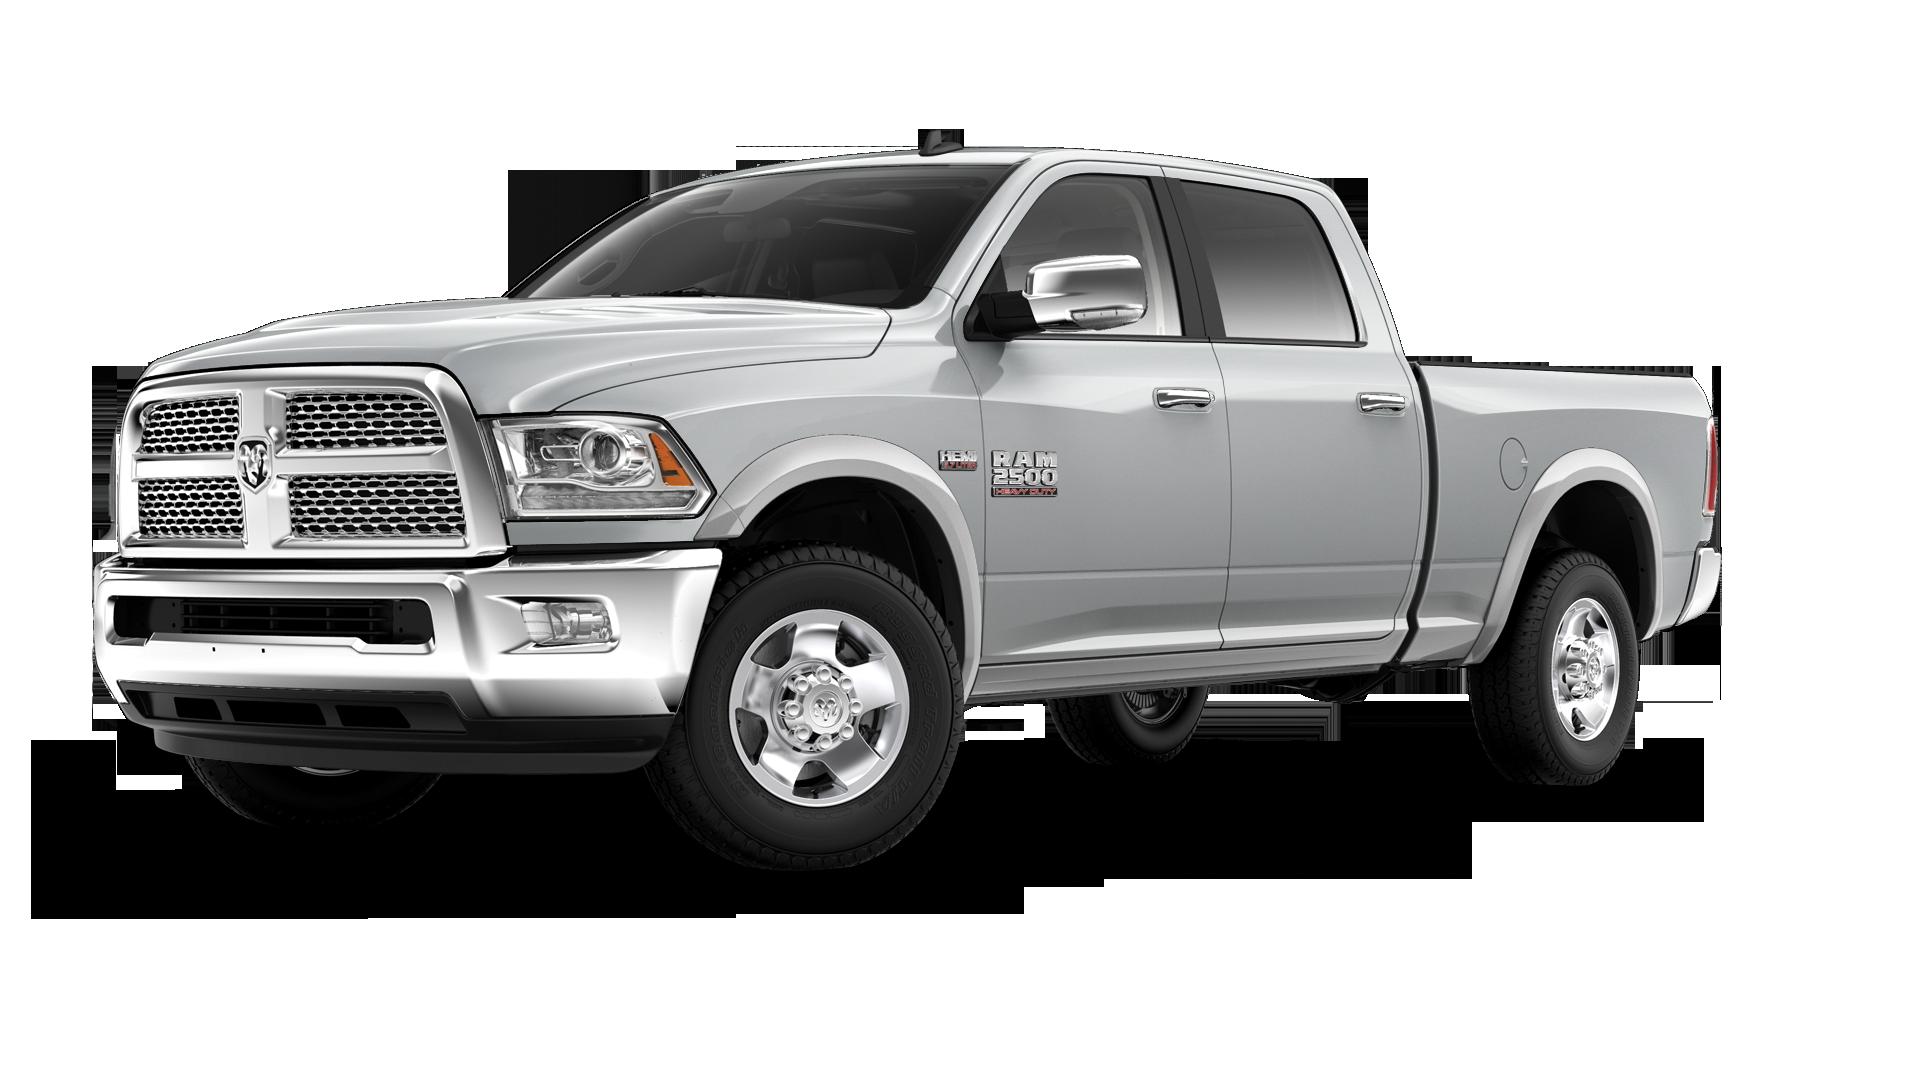 2015 ram 2500 - White 2014 Dodge Ram 2500 Lifted